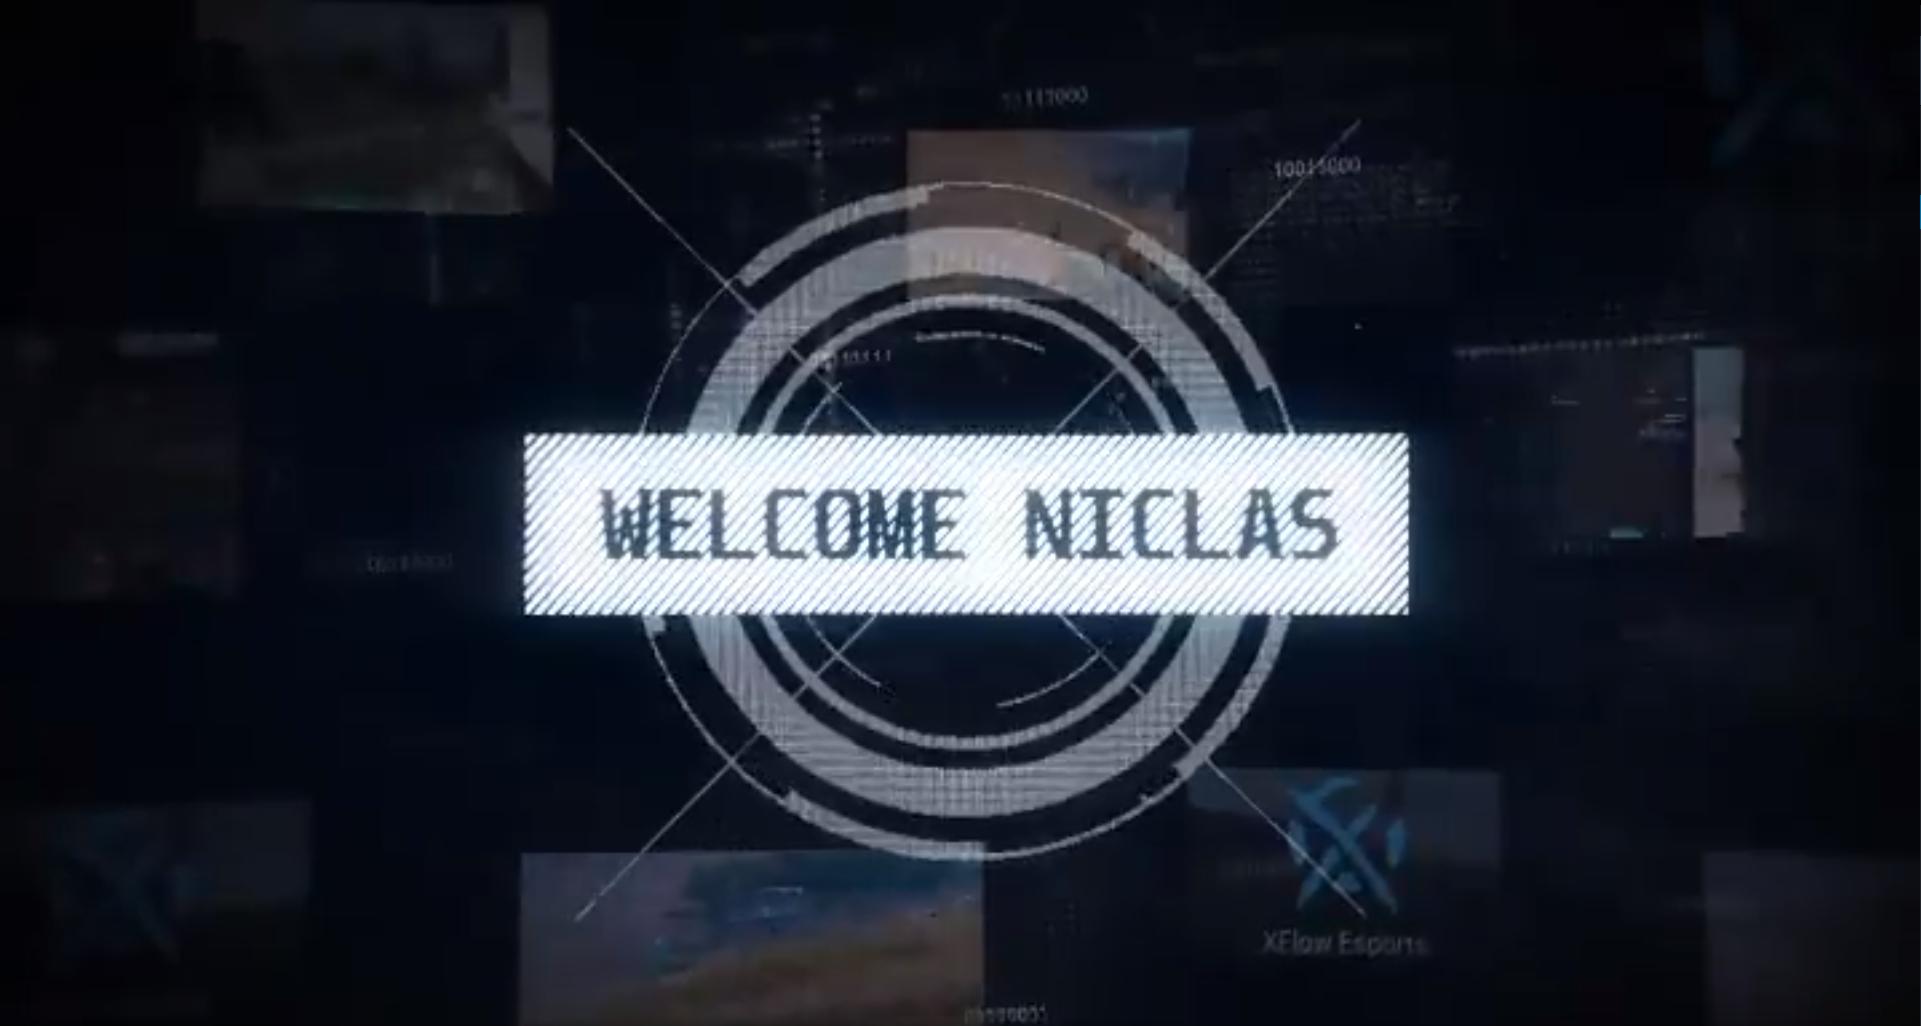 XFlow Esports PUBG